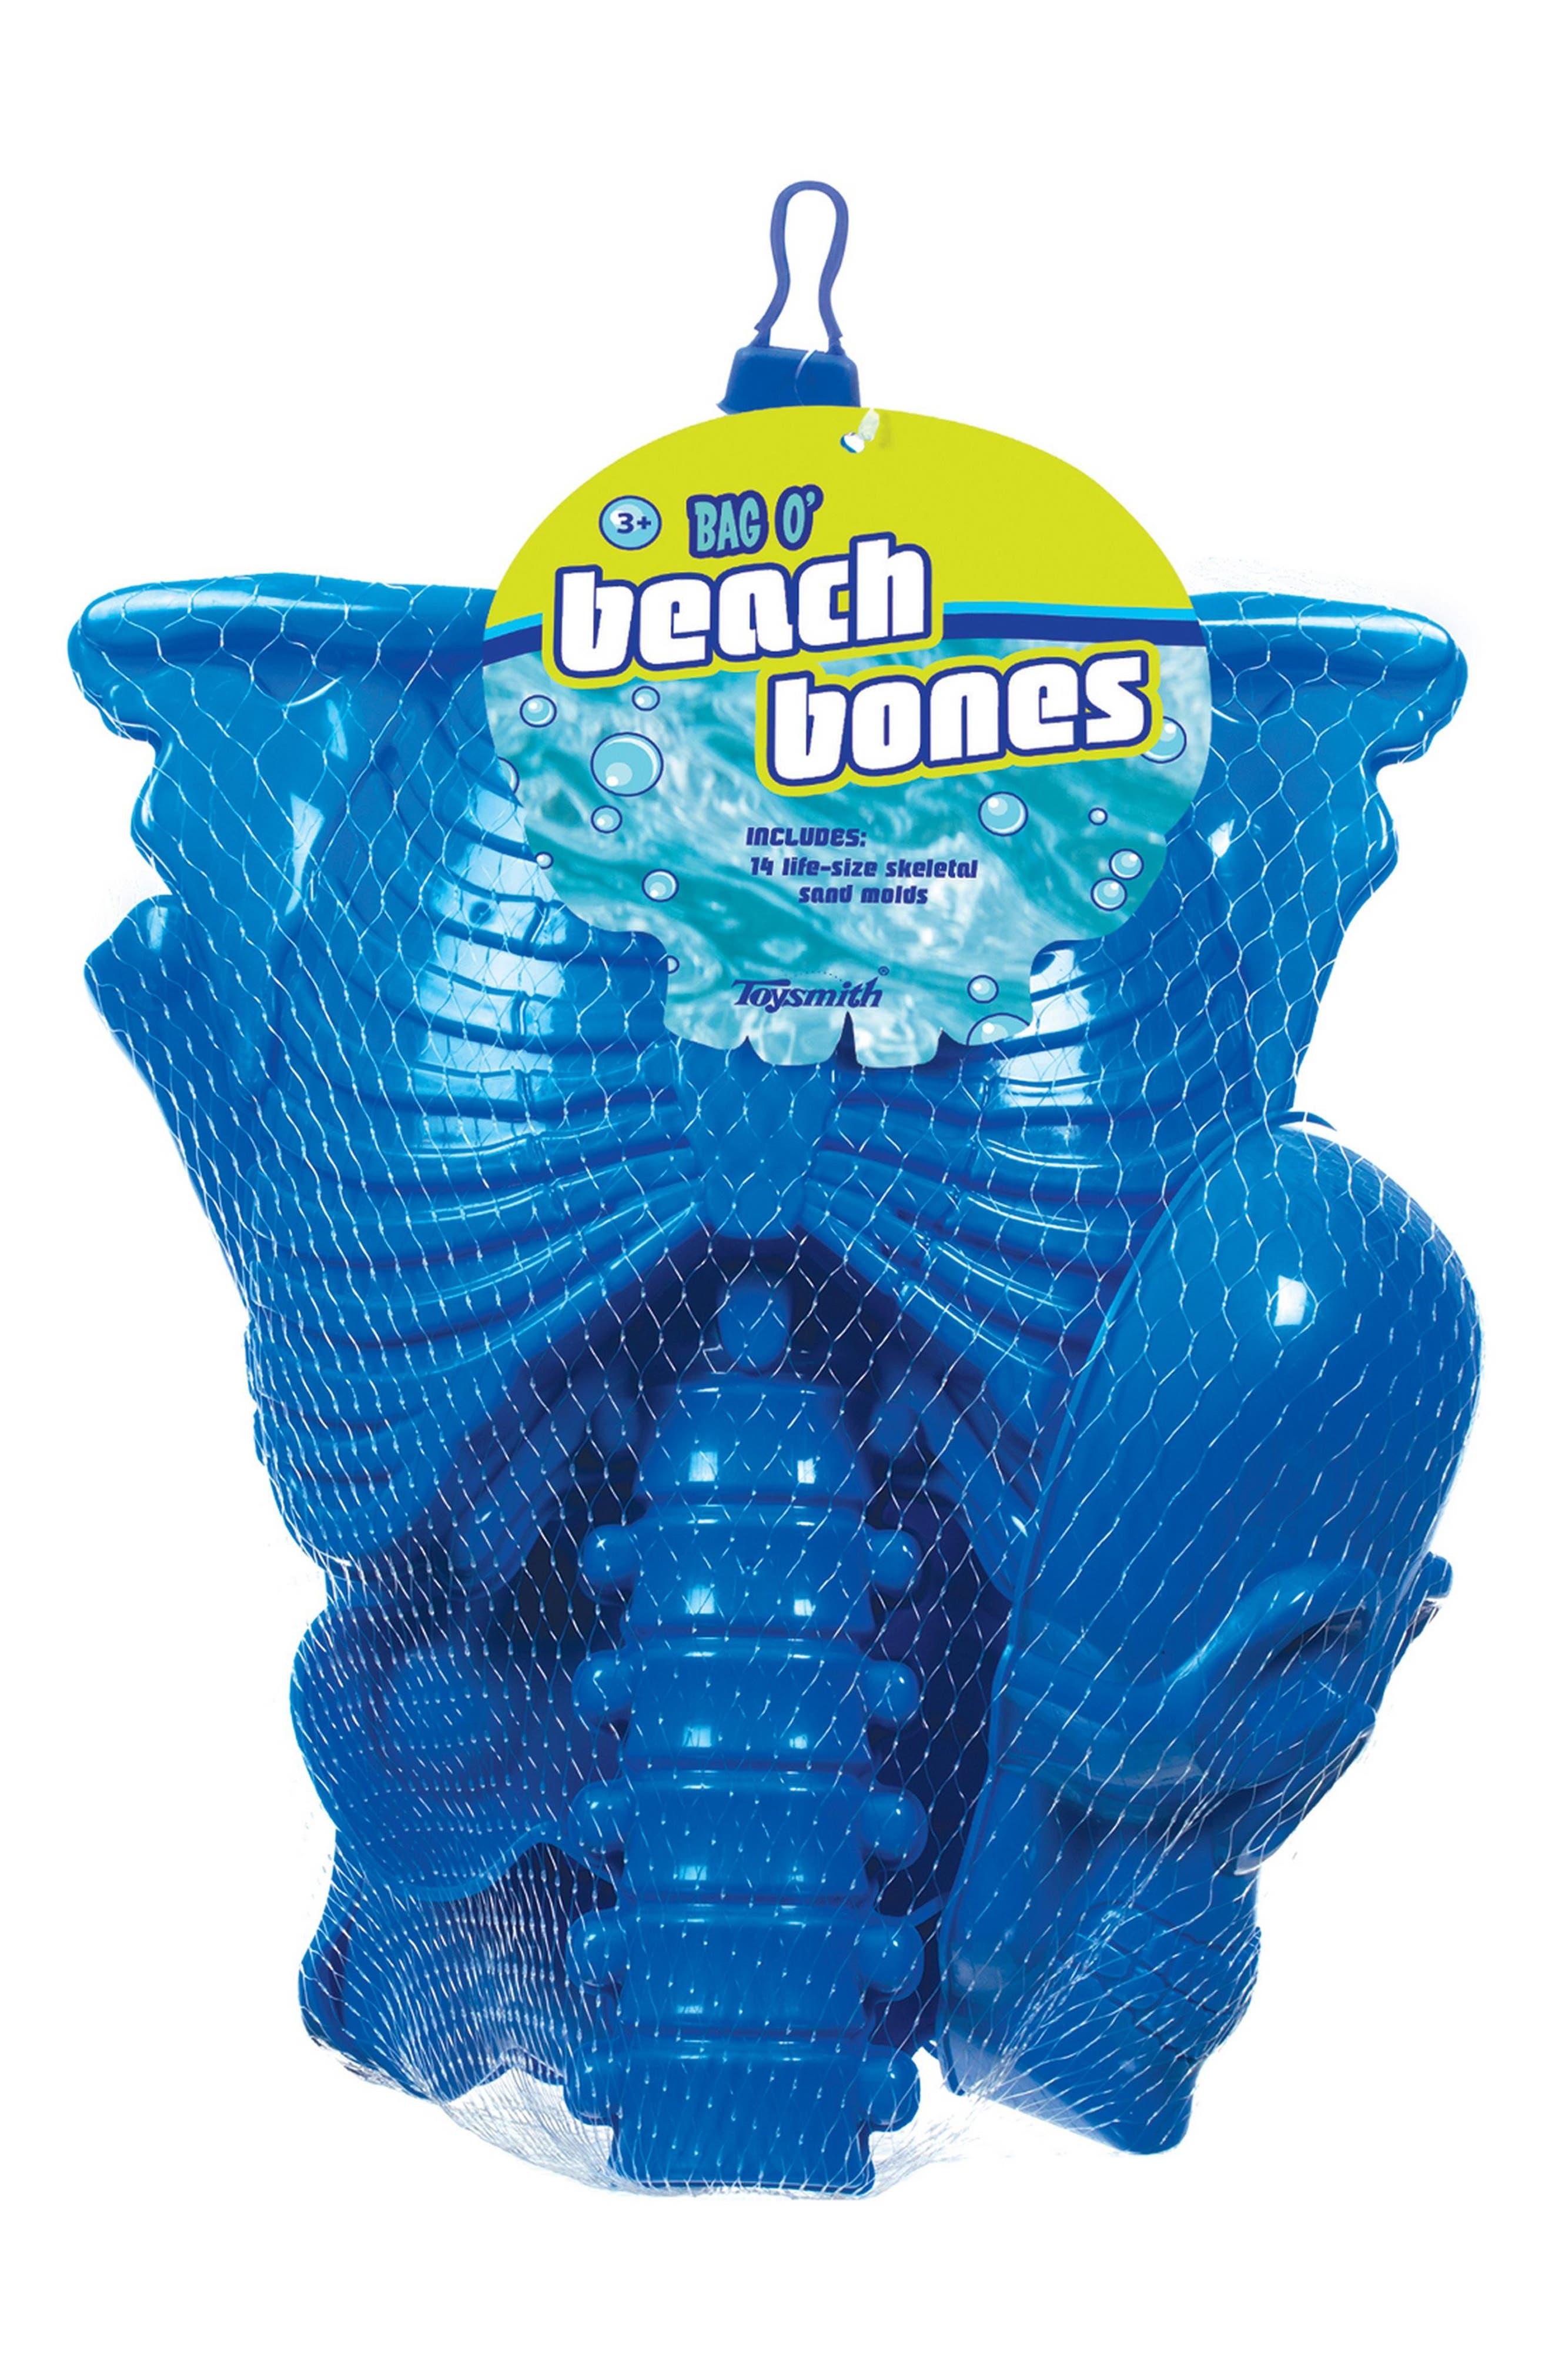 Bag O' Beach Bones Beach Toy Kit,                         Main,                         color, 400